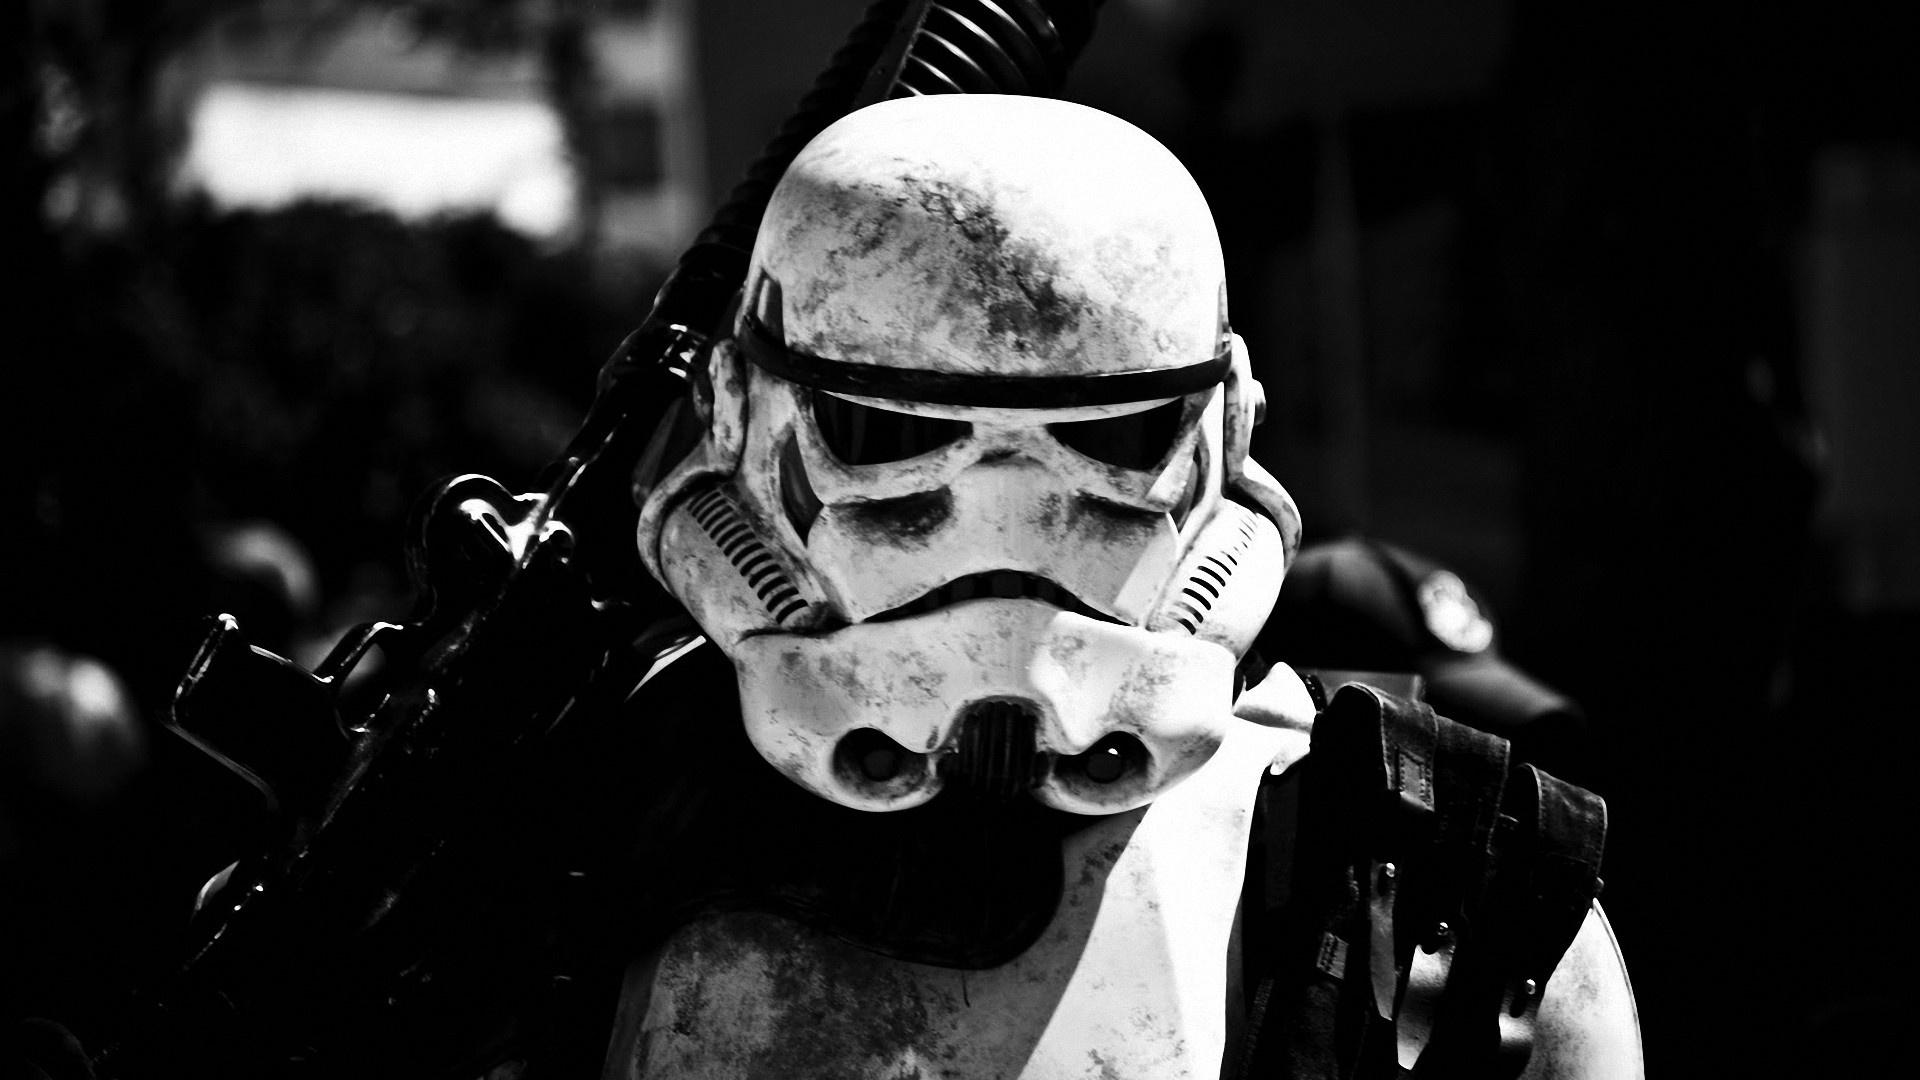 star-wars-stormtrooper-1920x1080.jpg